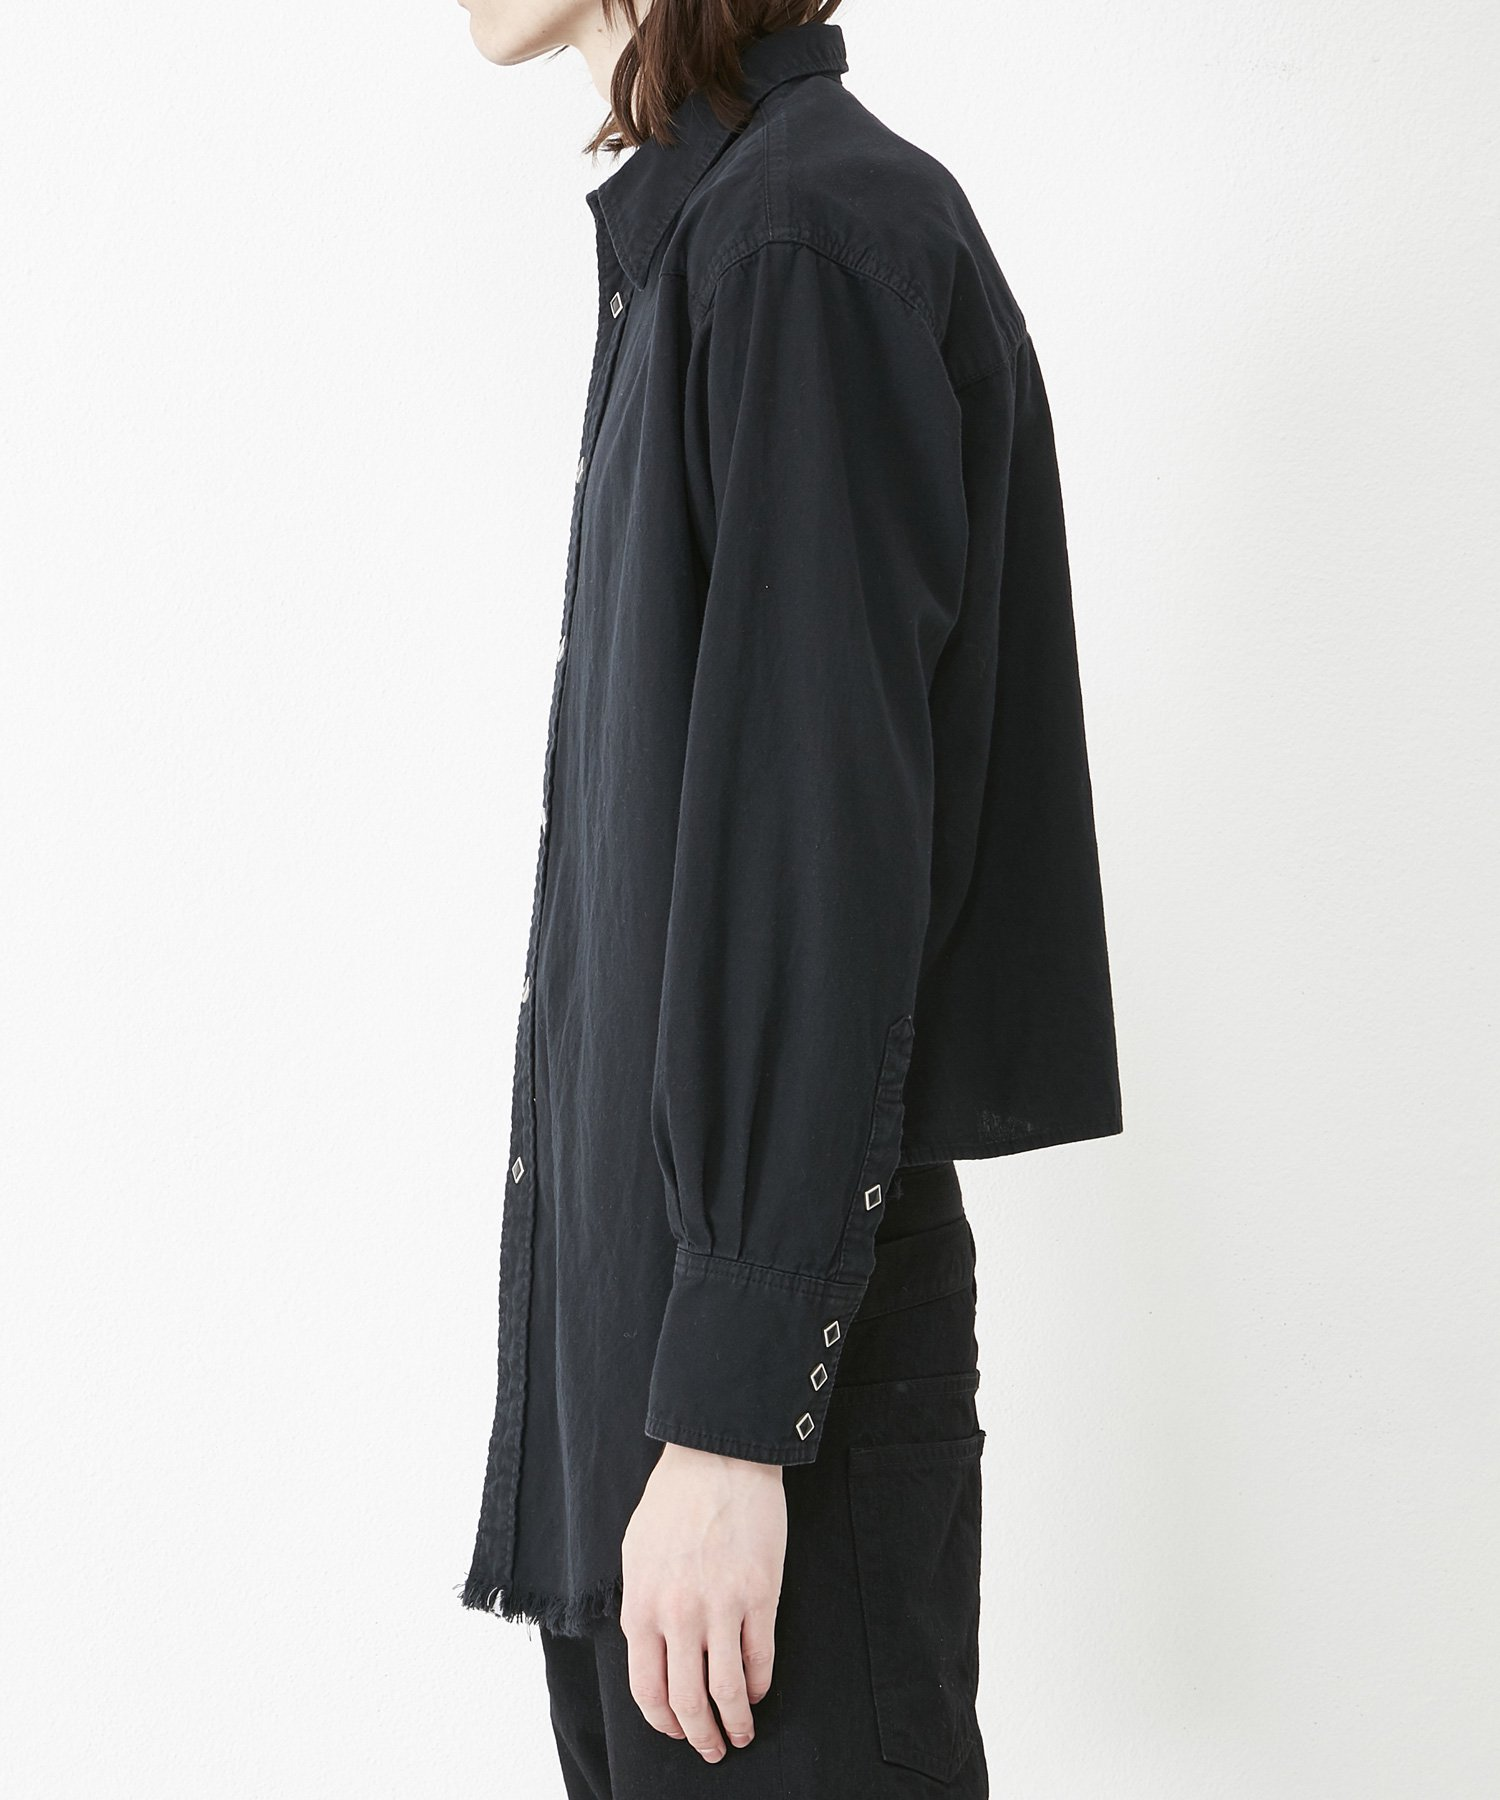 WESTERN SHIRT 【BLACK】